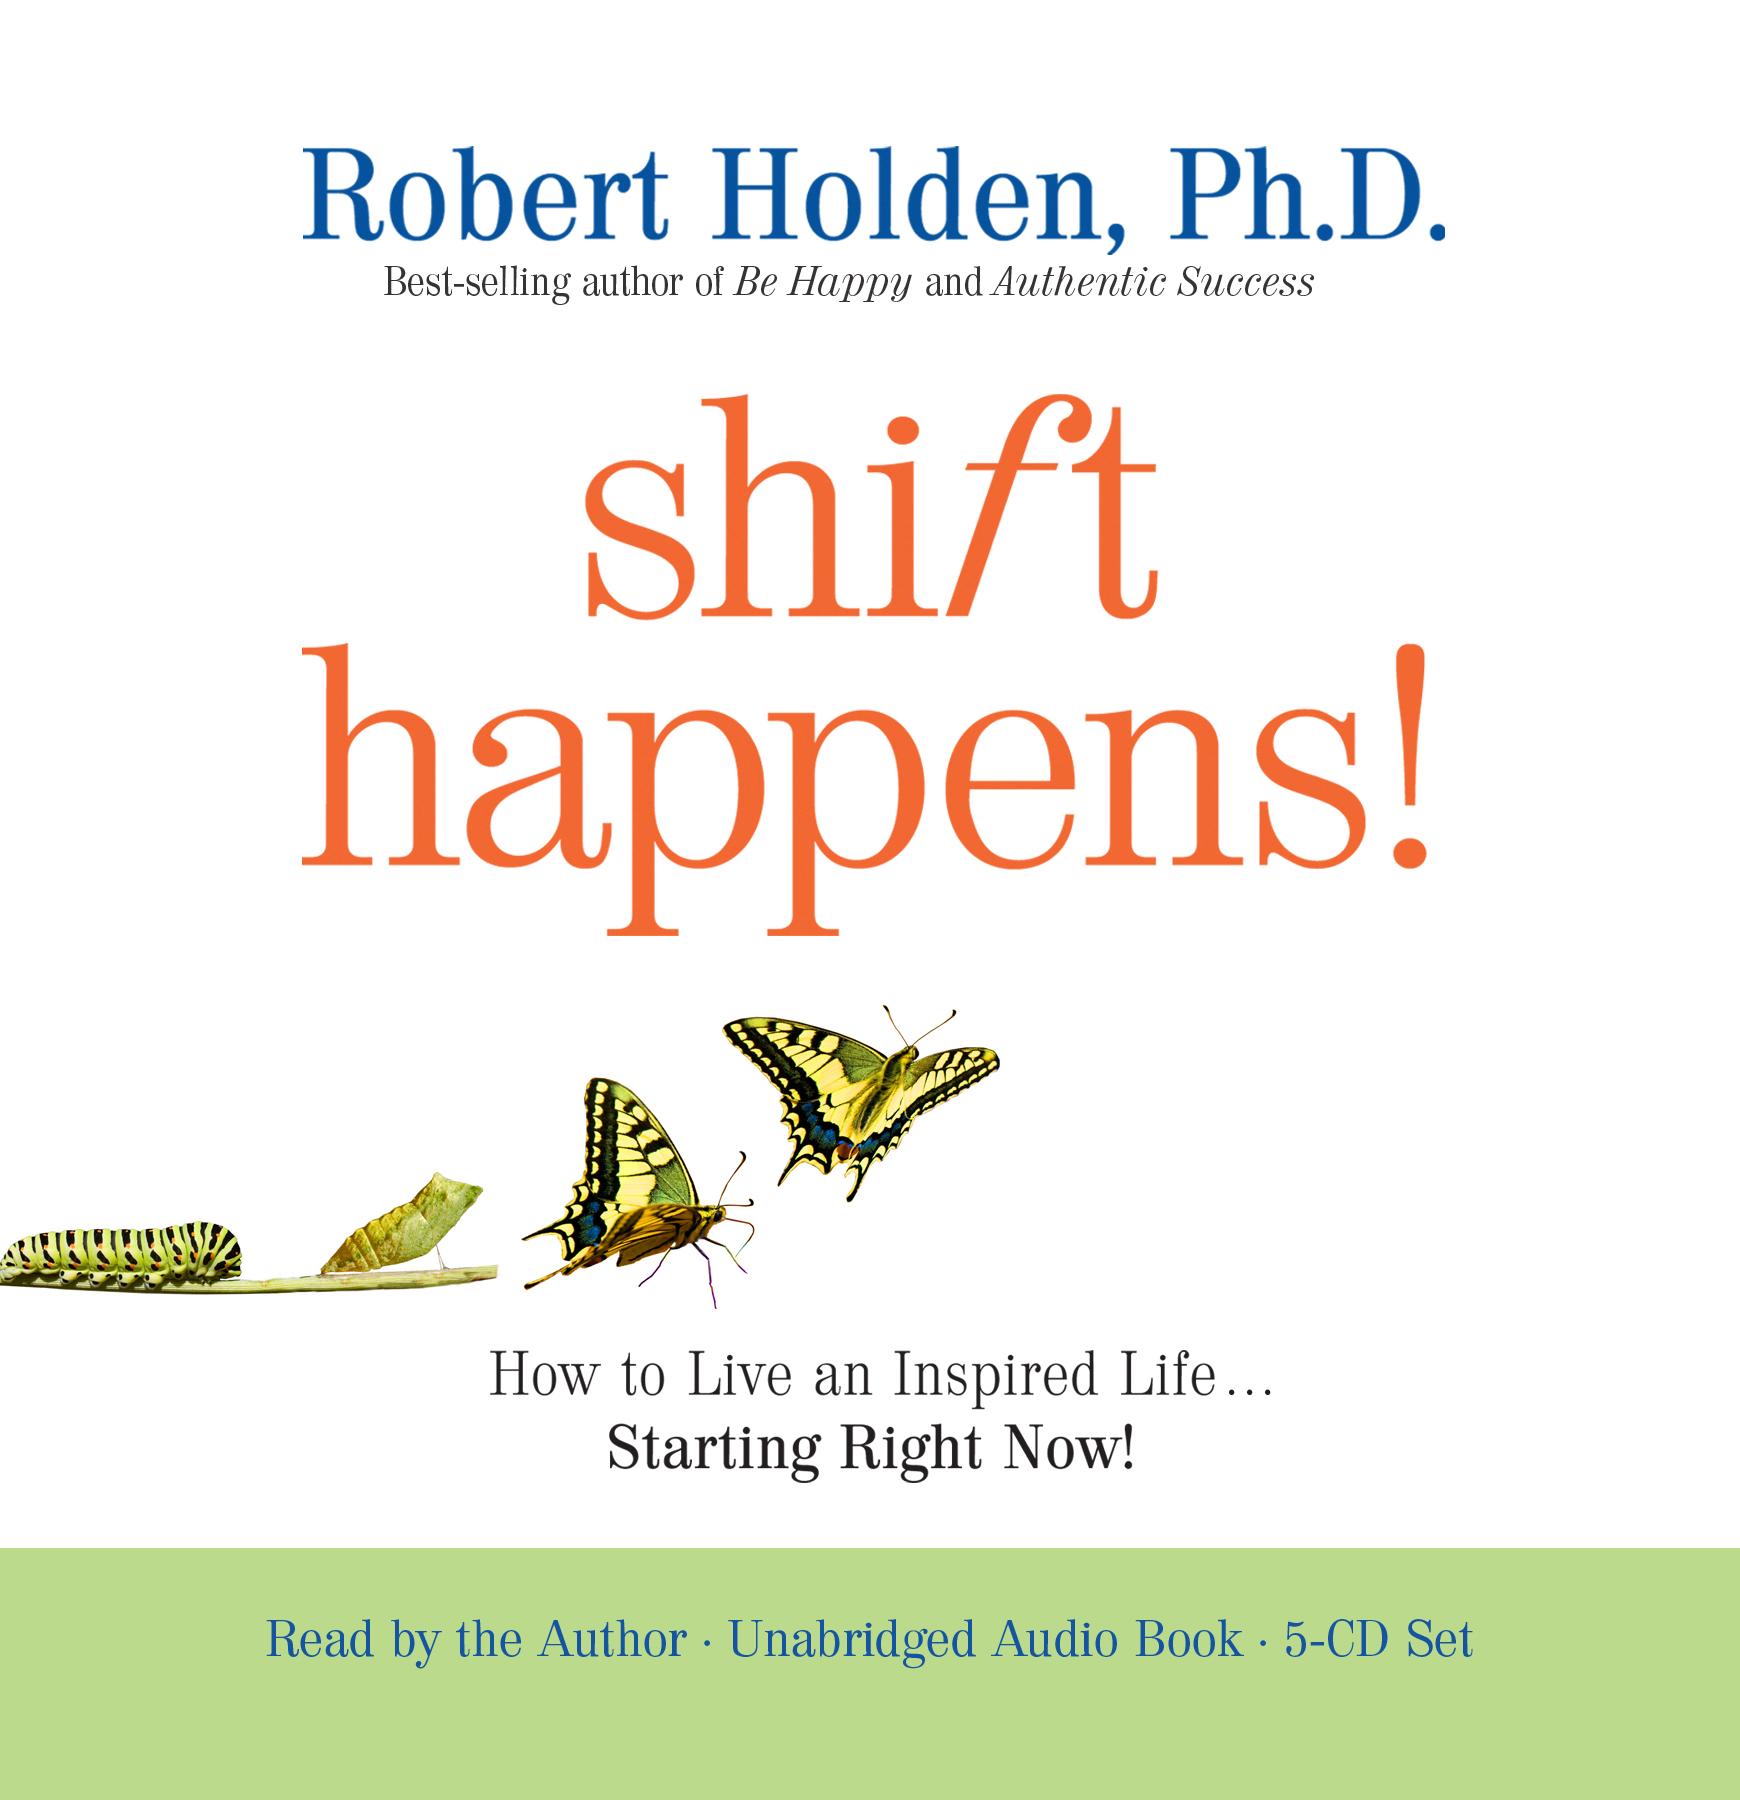 Shift-Happens-5-CD-RGB.jpg